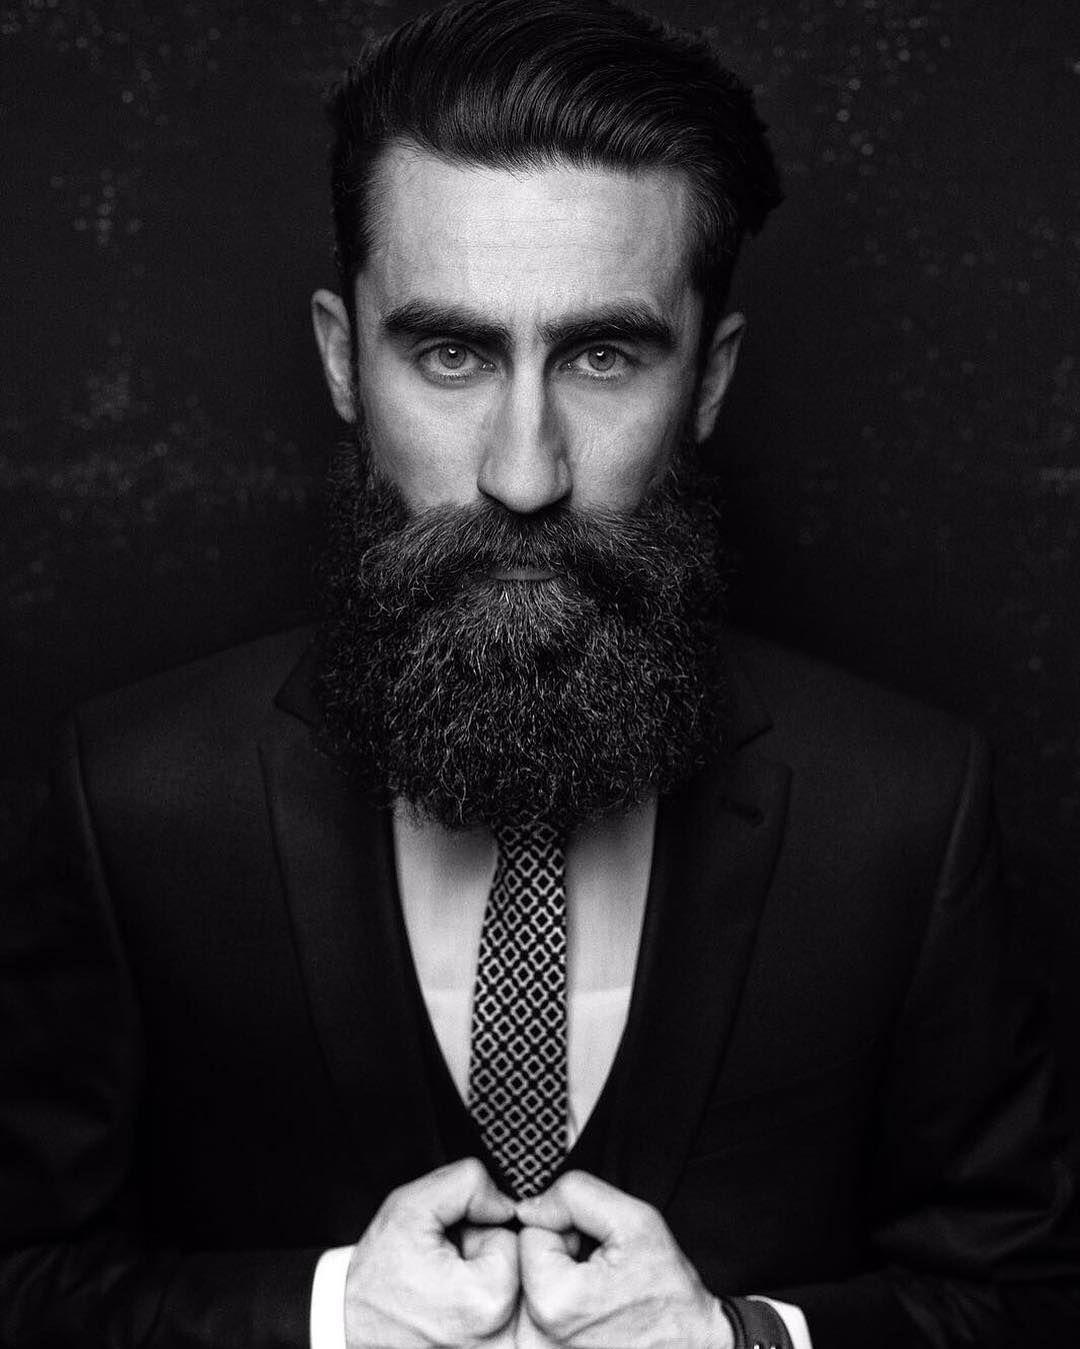 Eyup bolatli full thick bushy dark beard mustache beards bearded